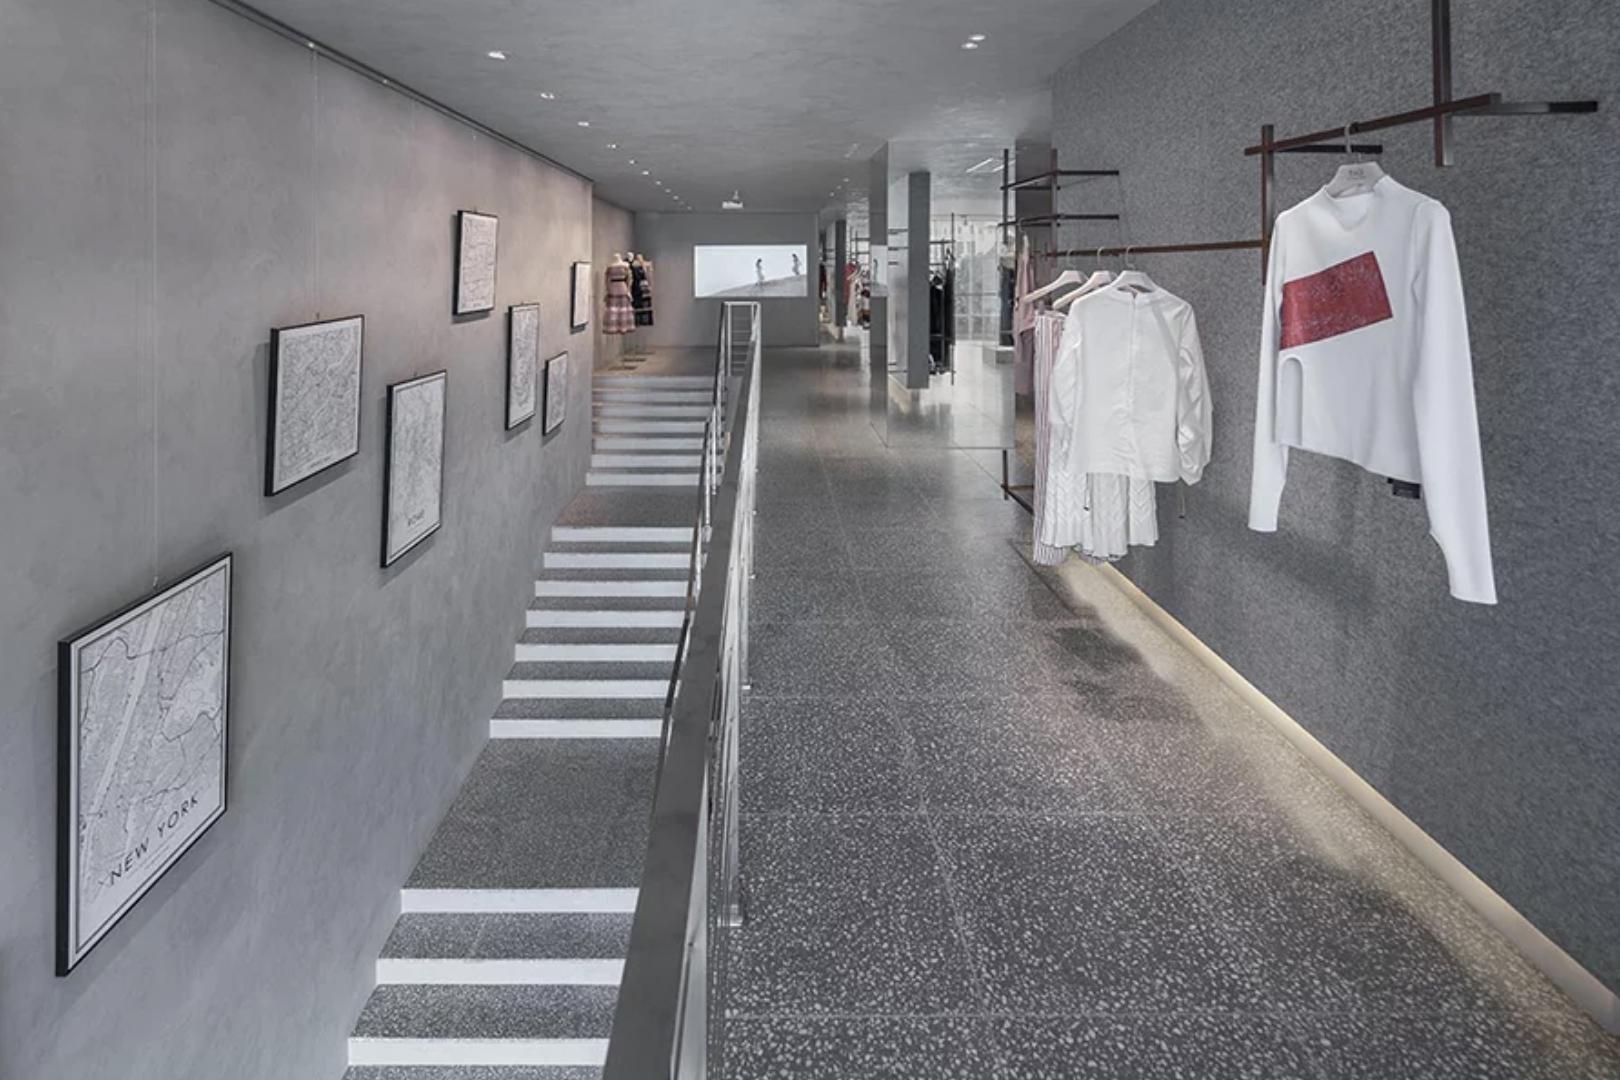 viventium-design-zac-kraemer-tag-boutique-retail-design-7.png